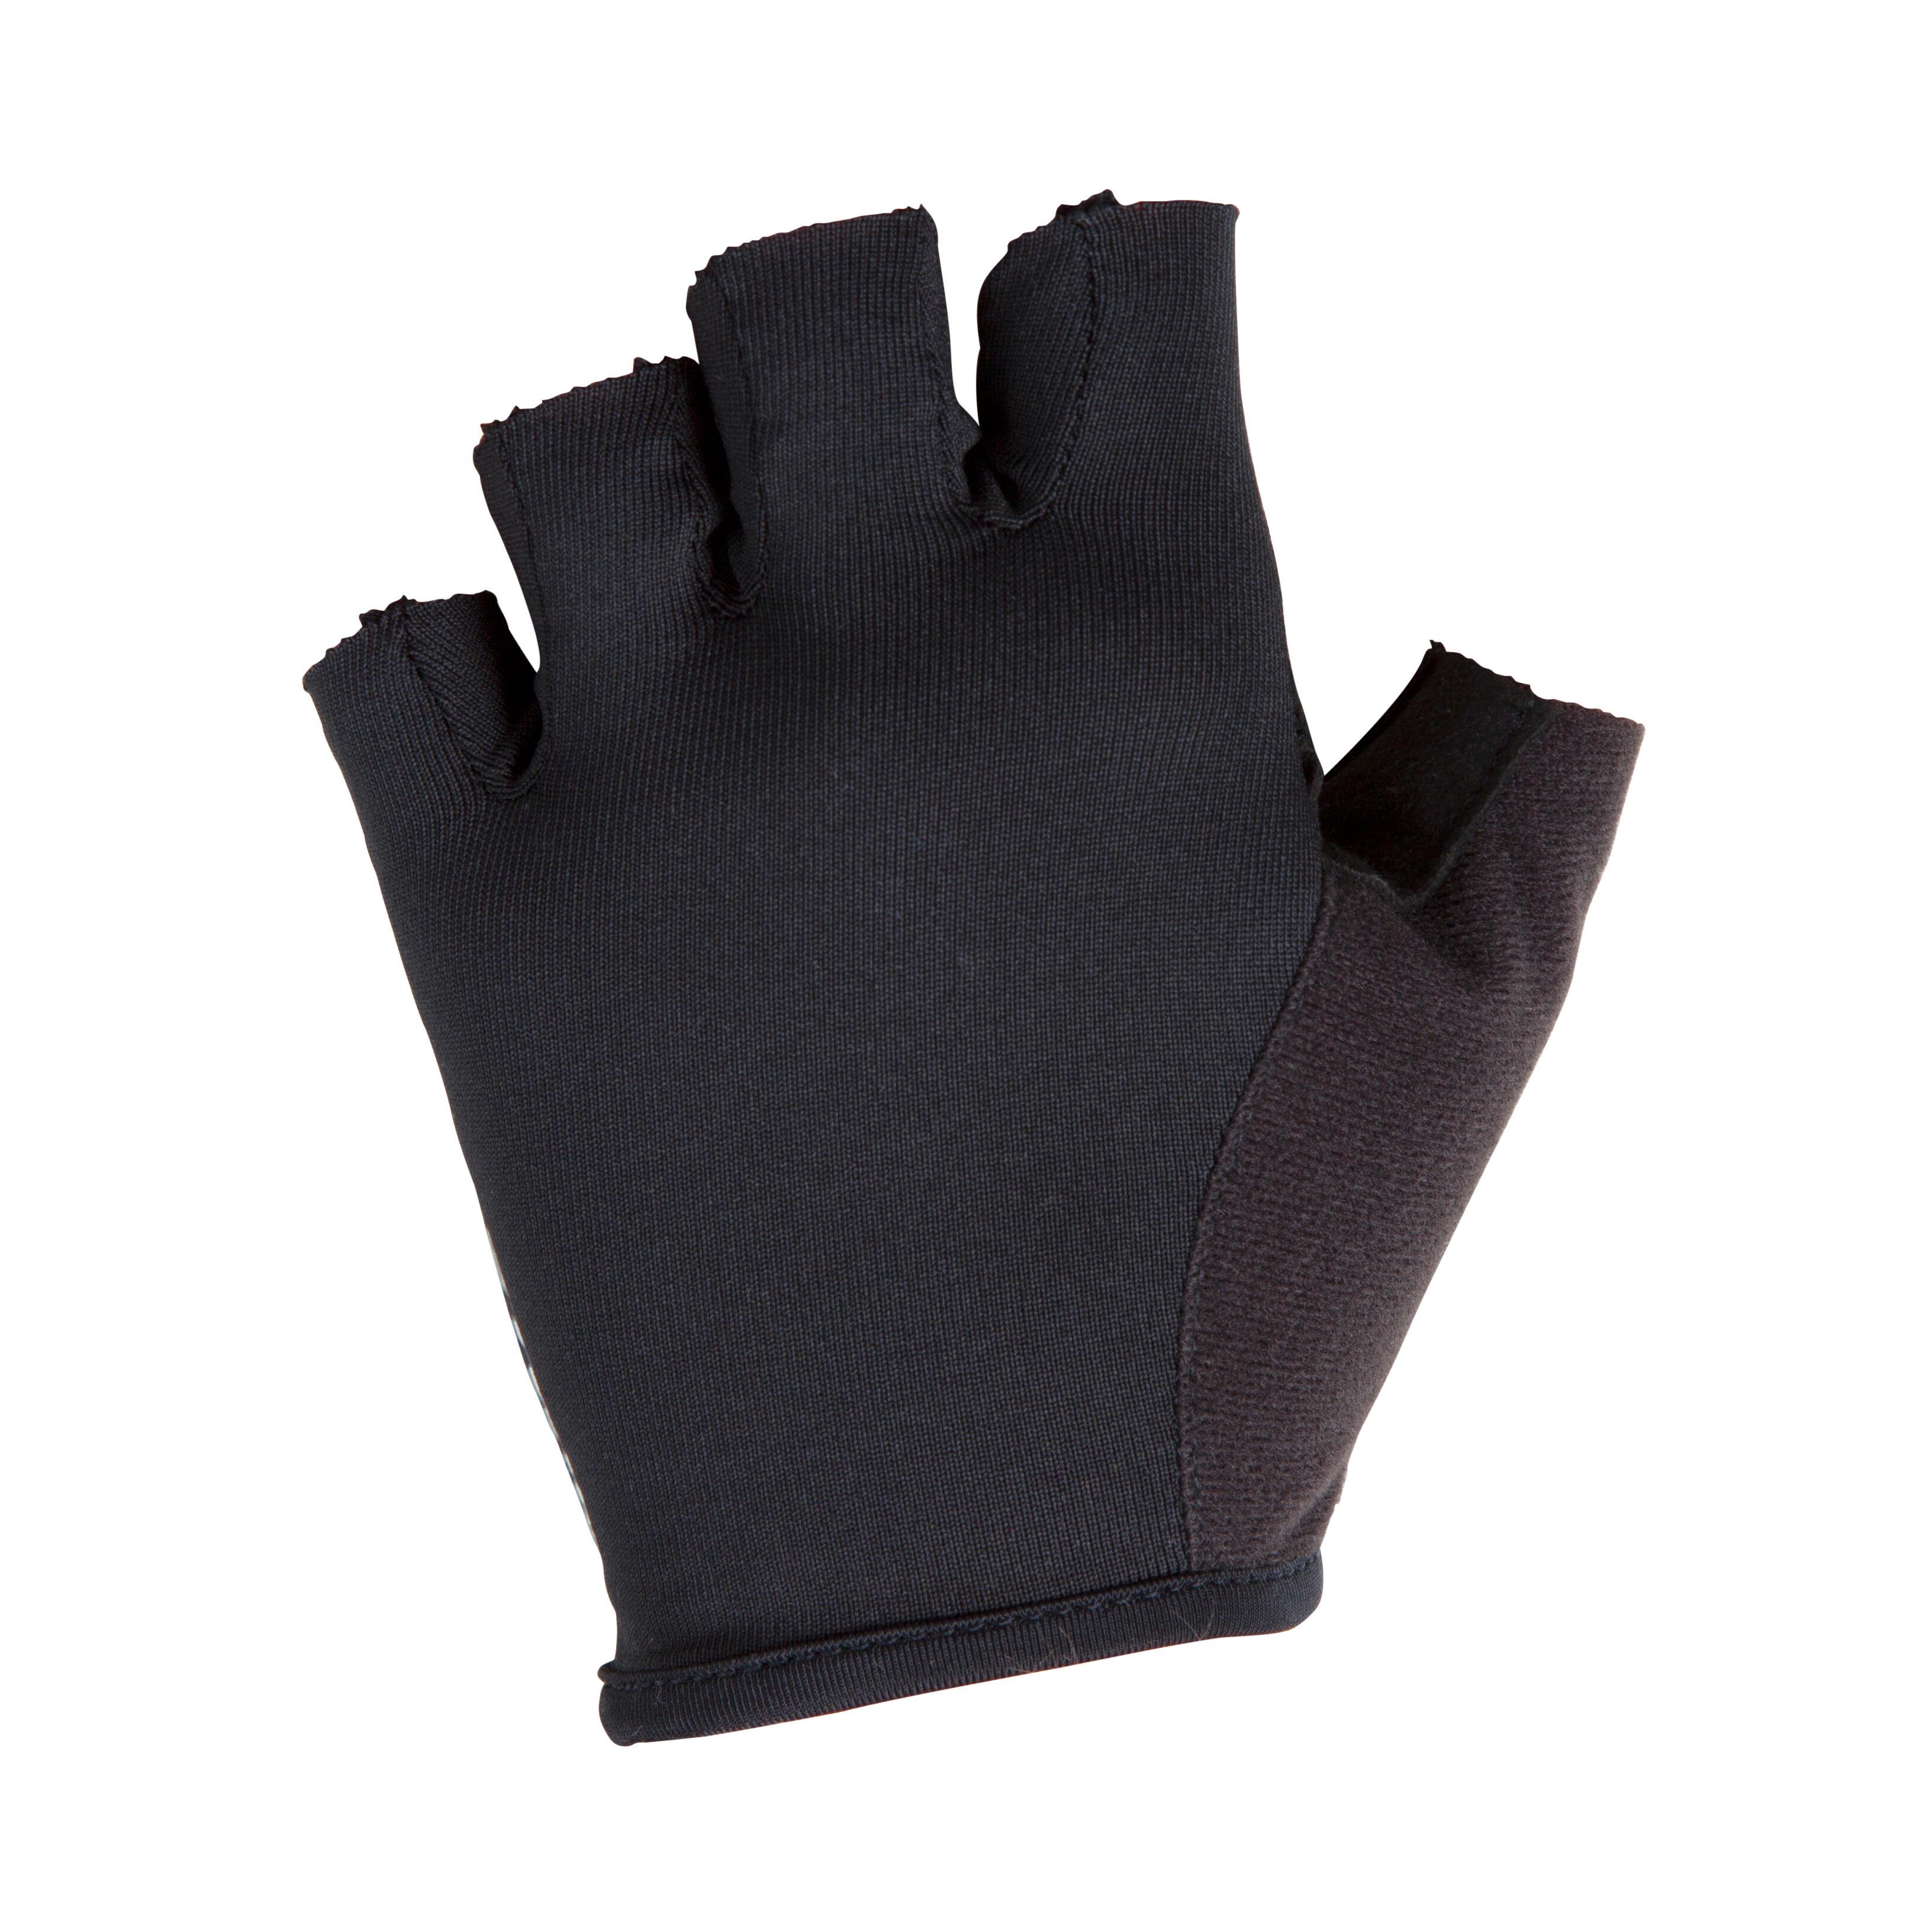 500 Kids' Cycling Gloves - Black